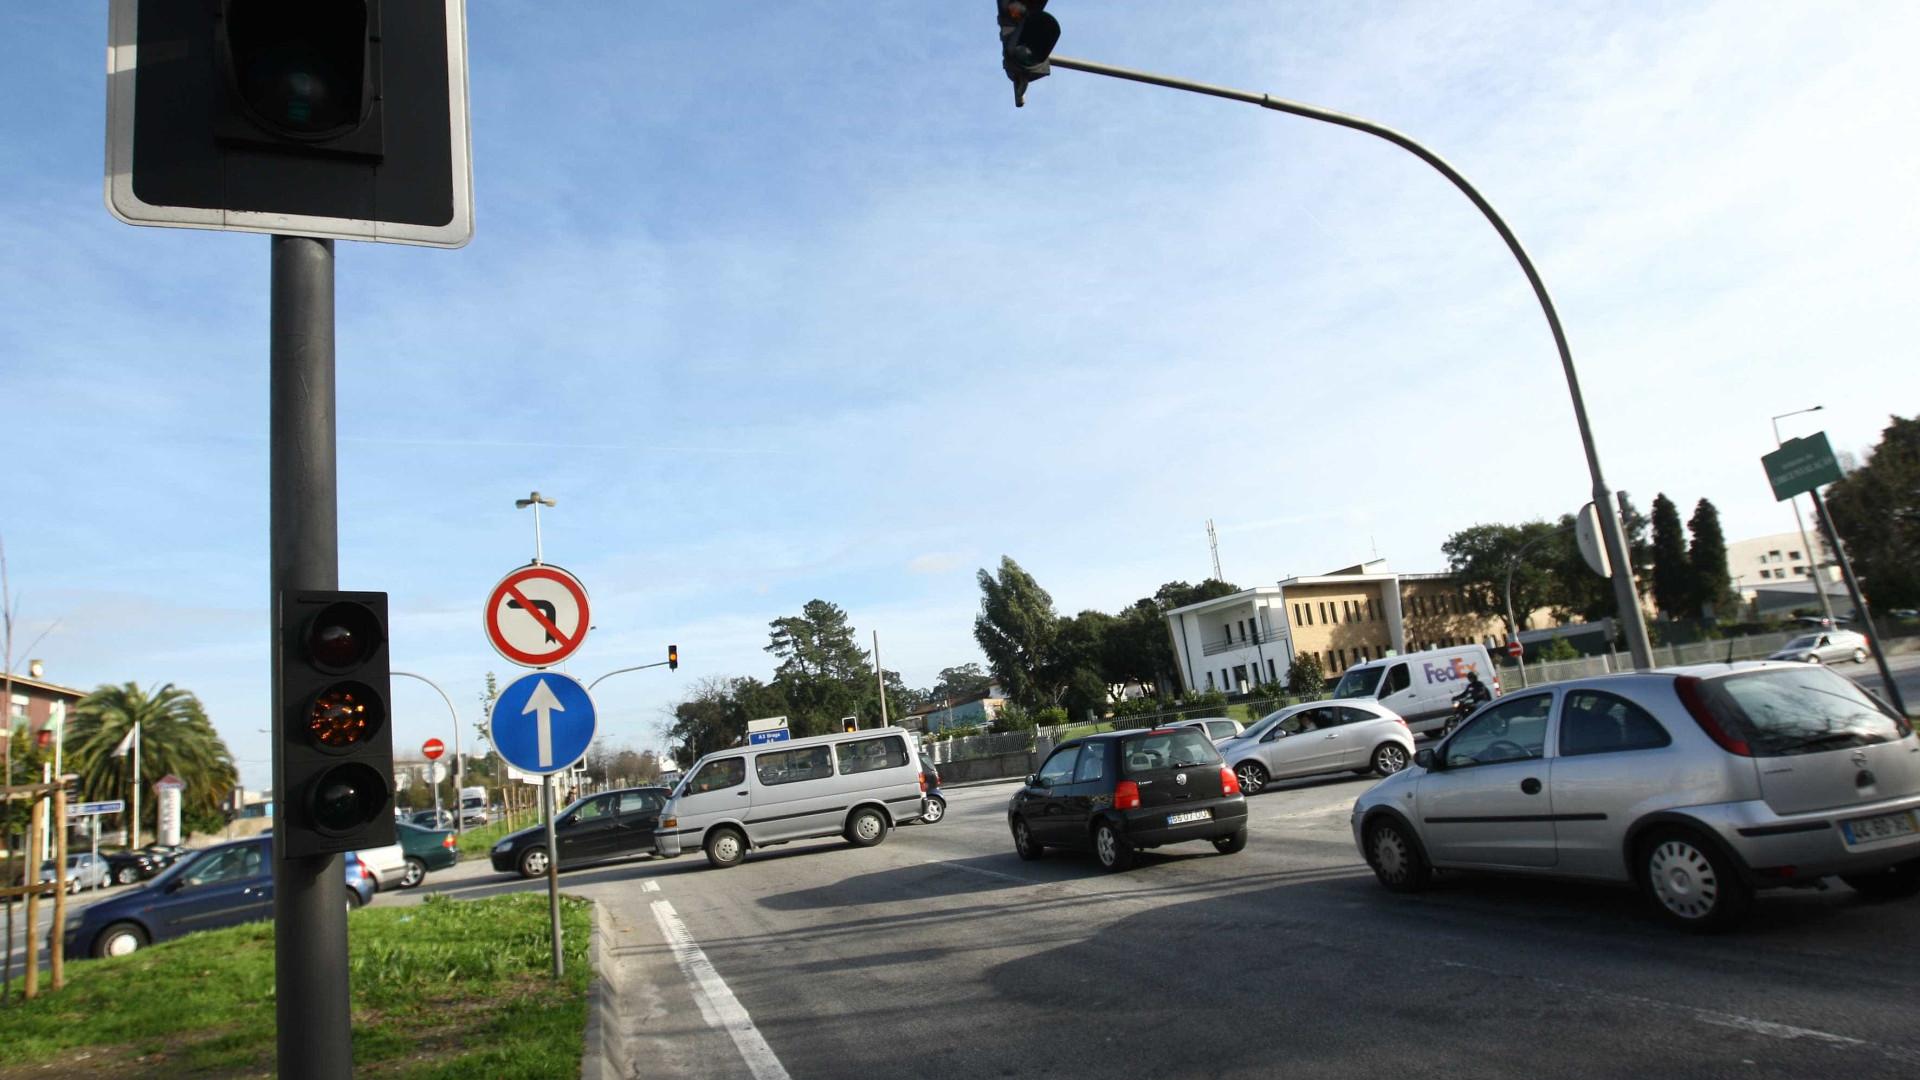 Novo projeto de 'carsharing' chega a Lisboa